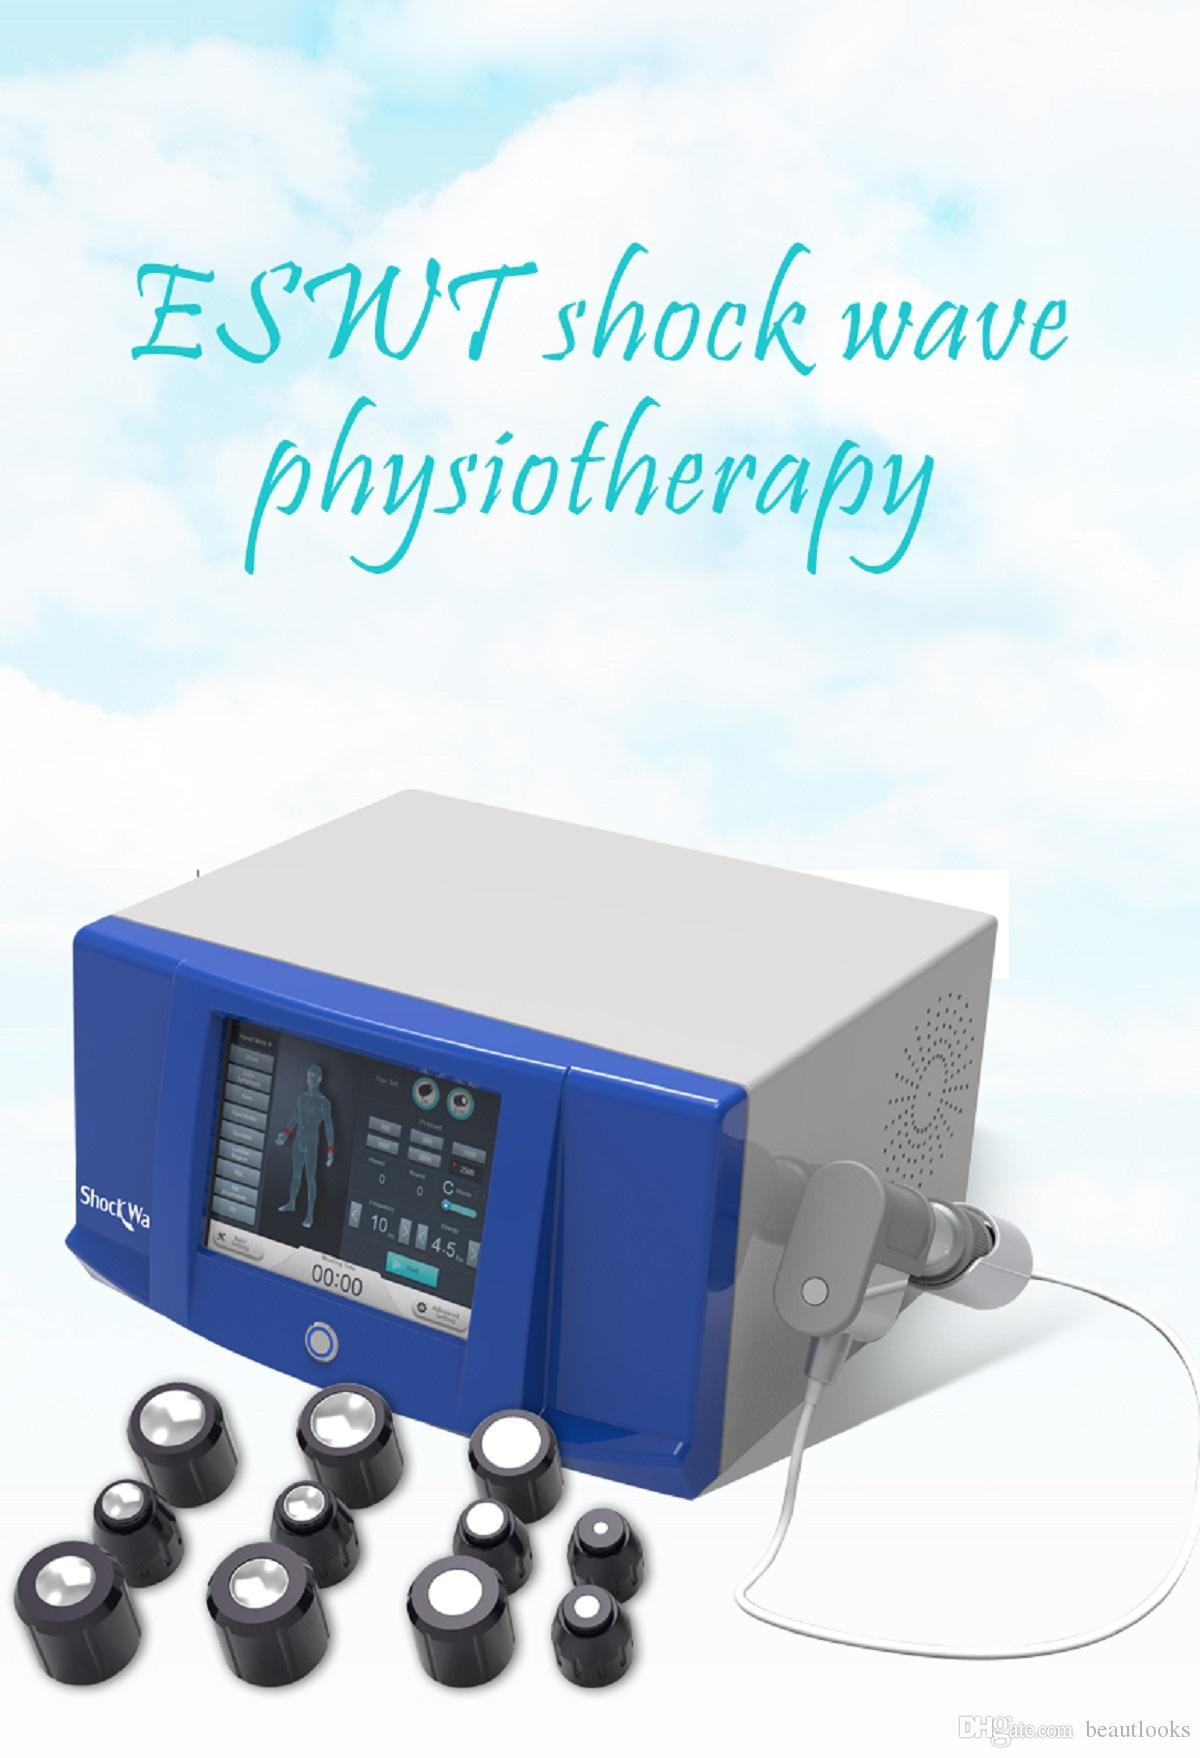 alivio Dolor articular onda de choque profesional terapia de la máquina 6 bar terapia de ondas de choque \ terapia de la máquina de ondas de choque neumático para ED